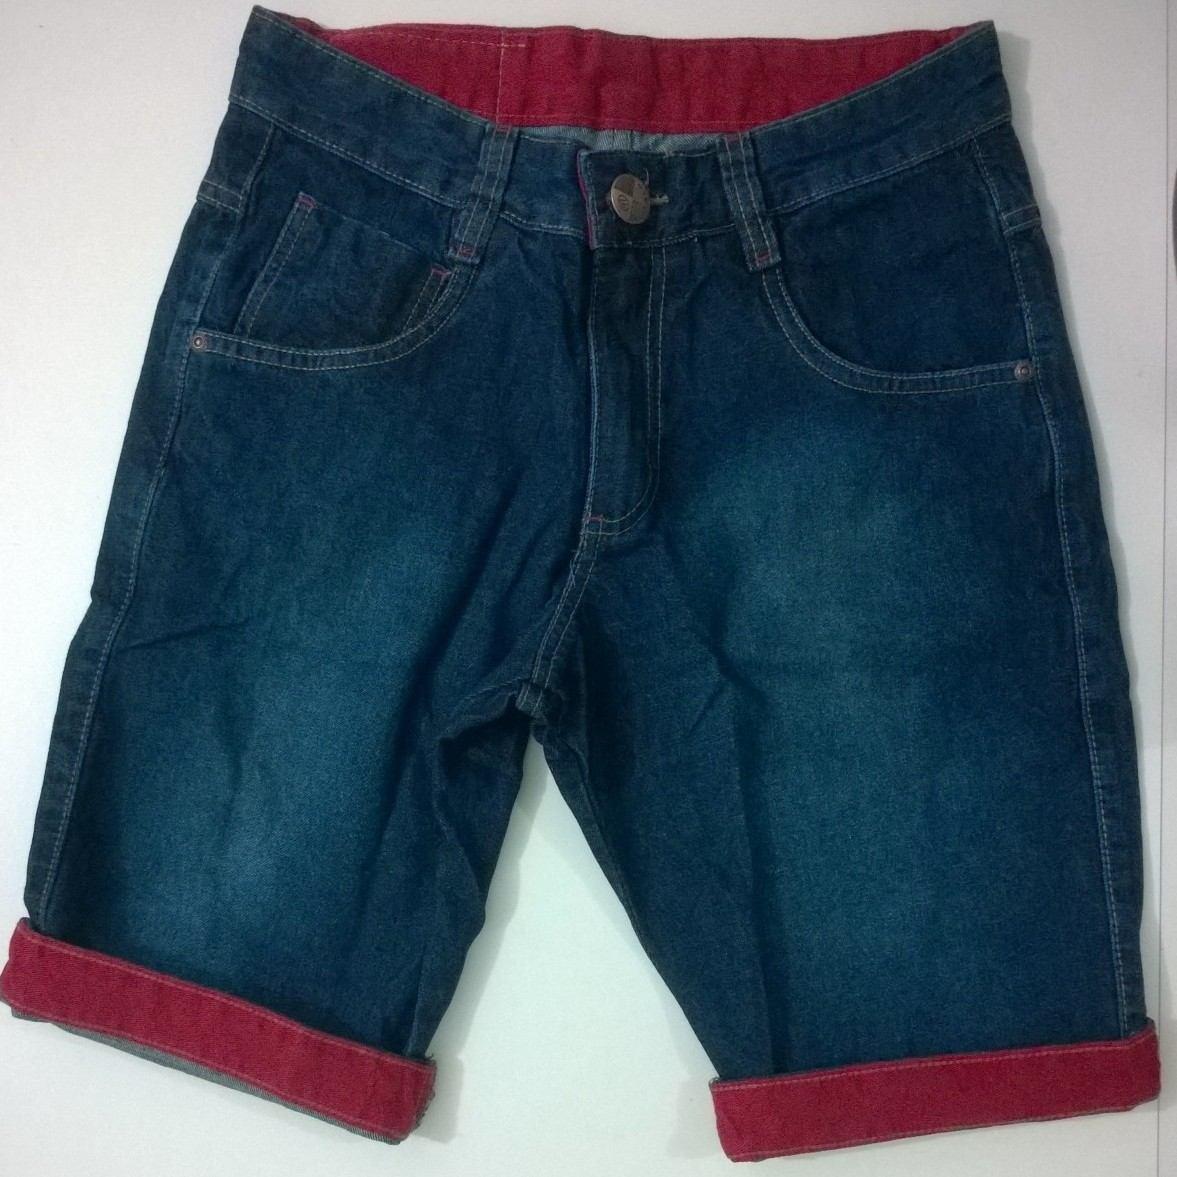 9a1884c75c bermuda jeans masculina oslen barra colorida. Carregando zoom.